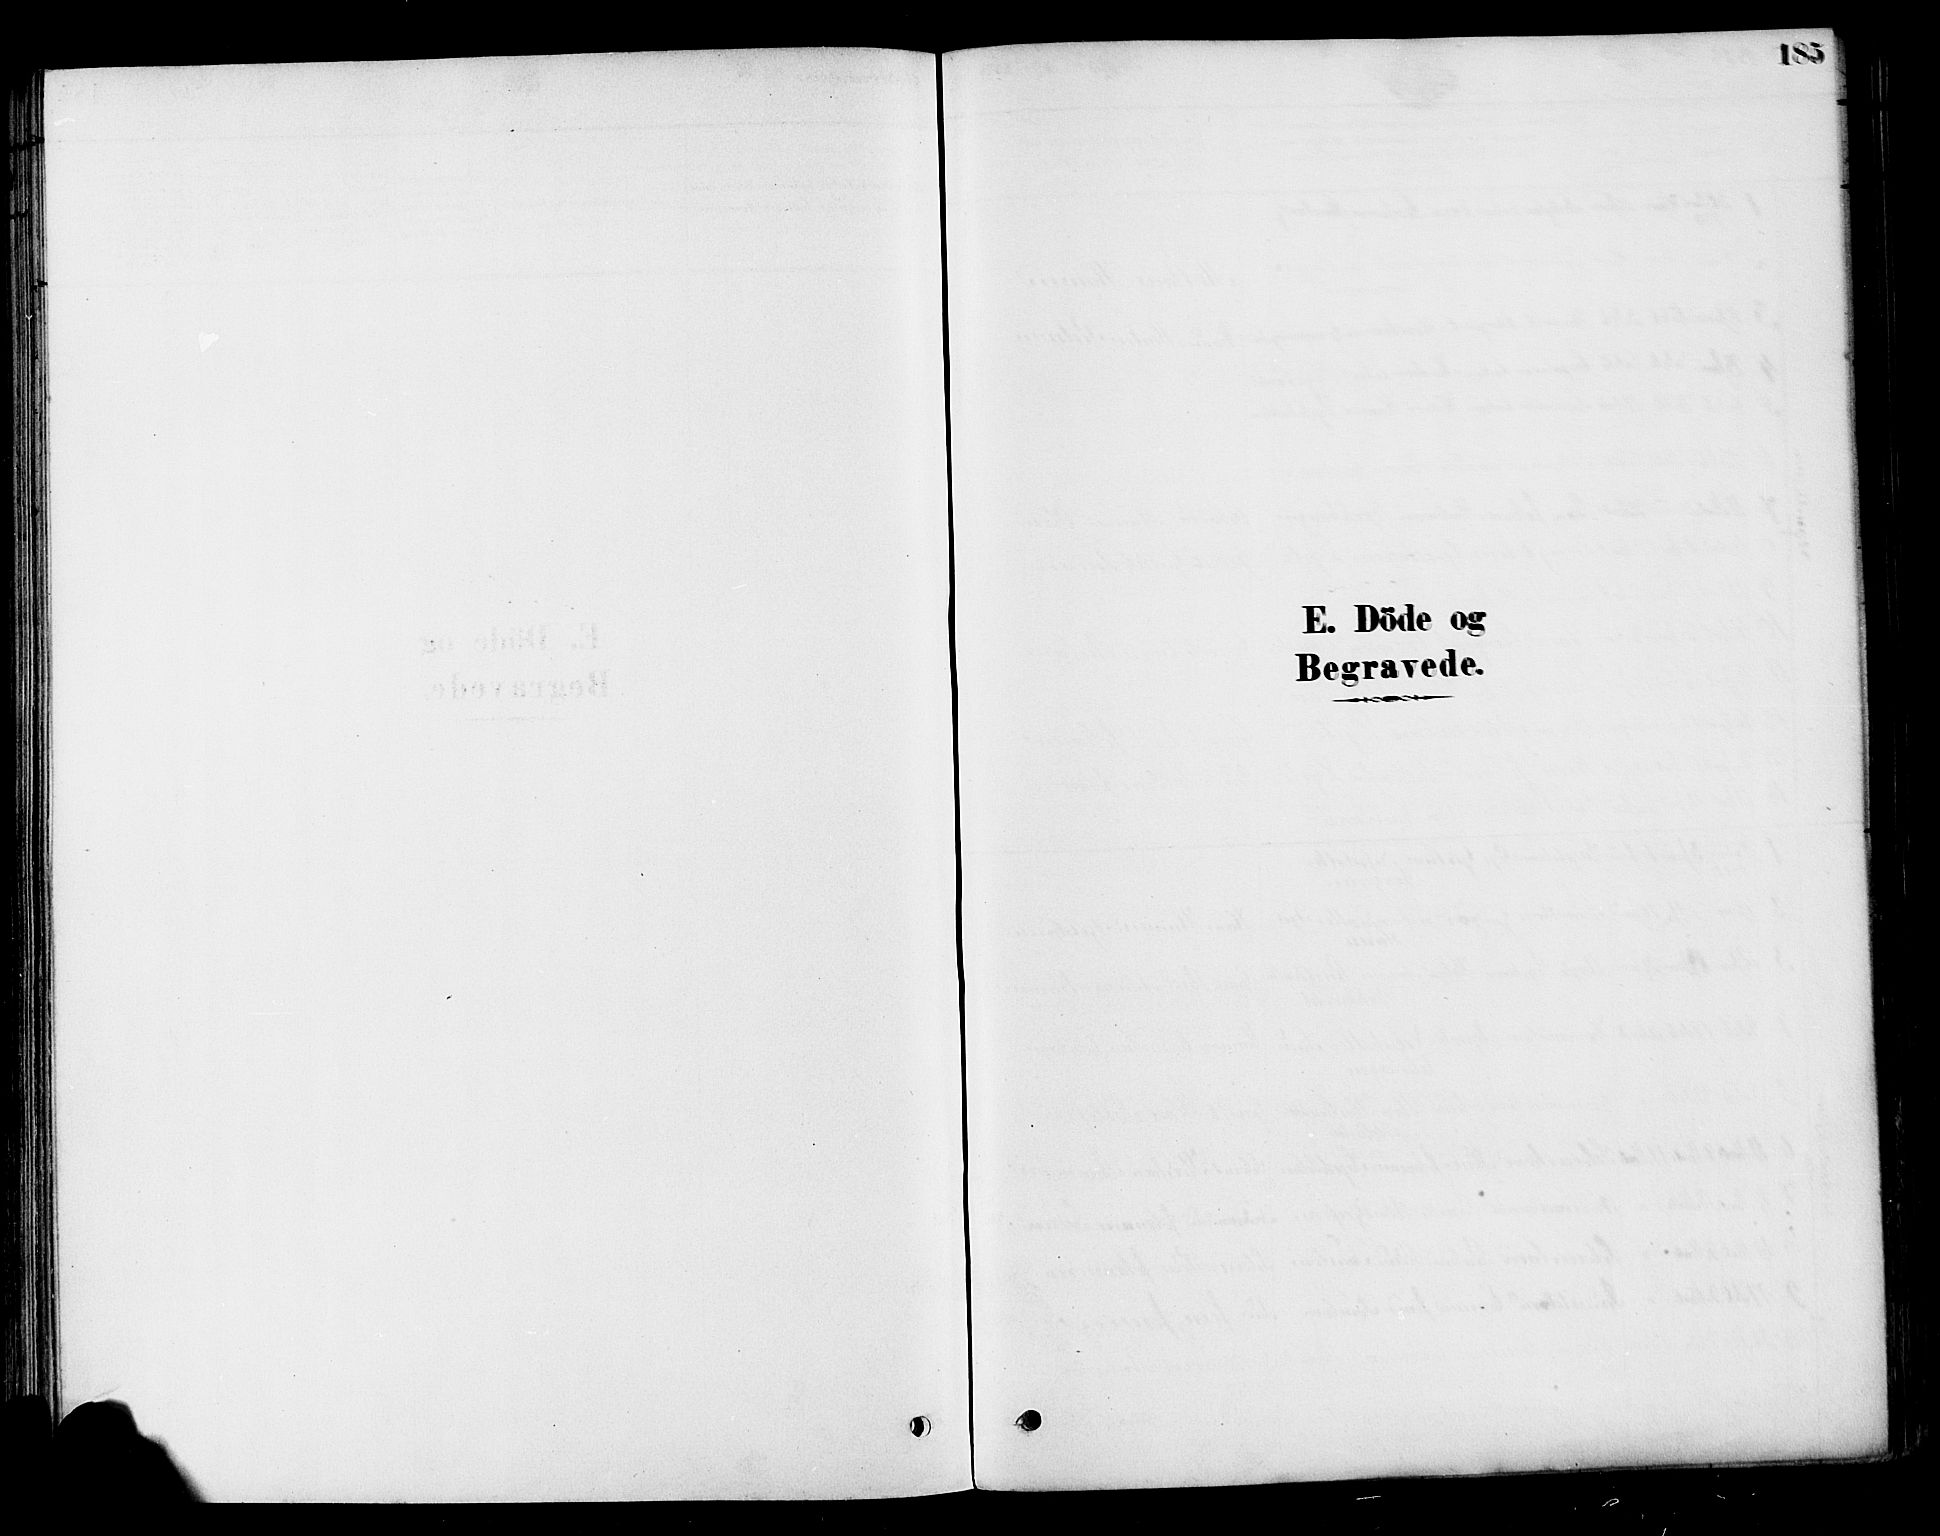 SAH, Vestre Toten prestekontor, H/Ha/Haa/L0010: Ministerialbok nr. 10, 1878-1894, s. 185